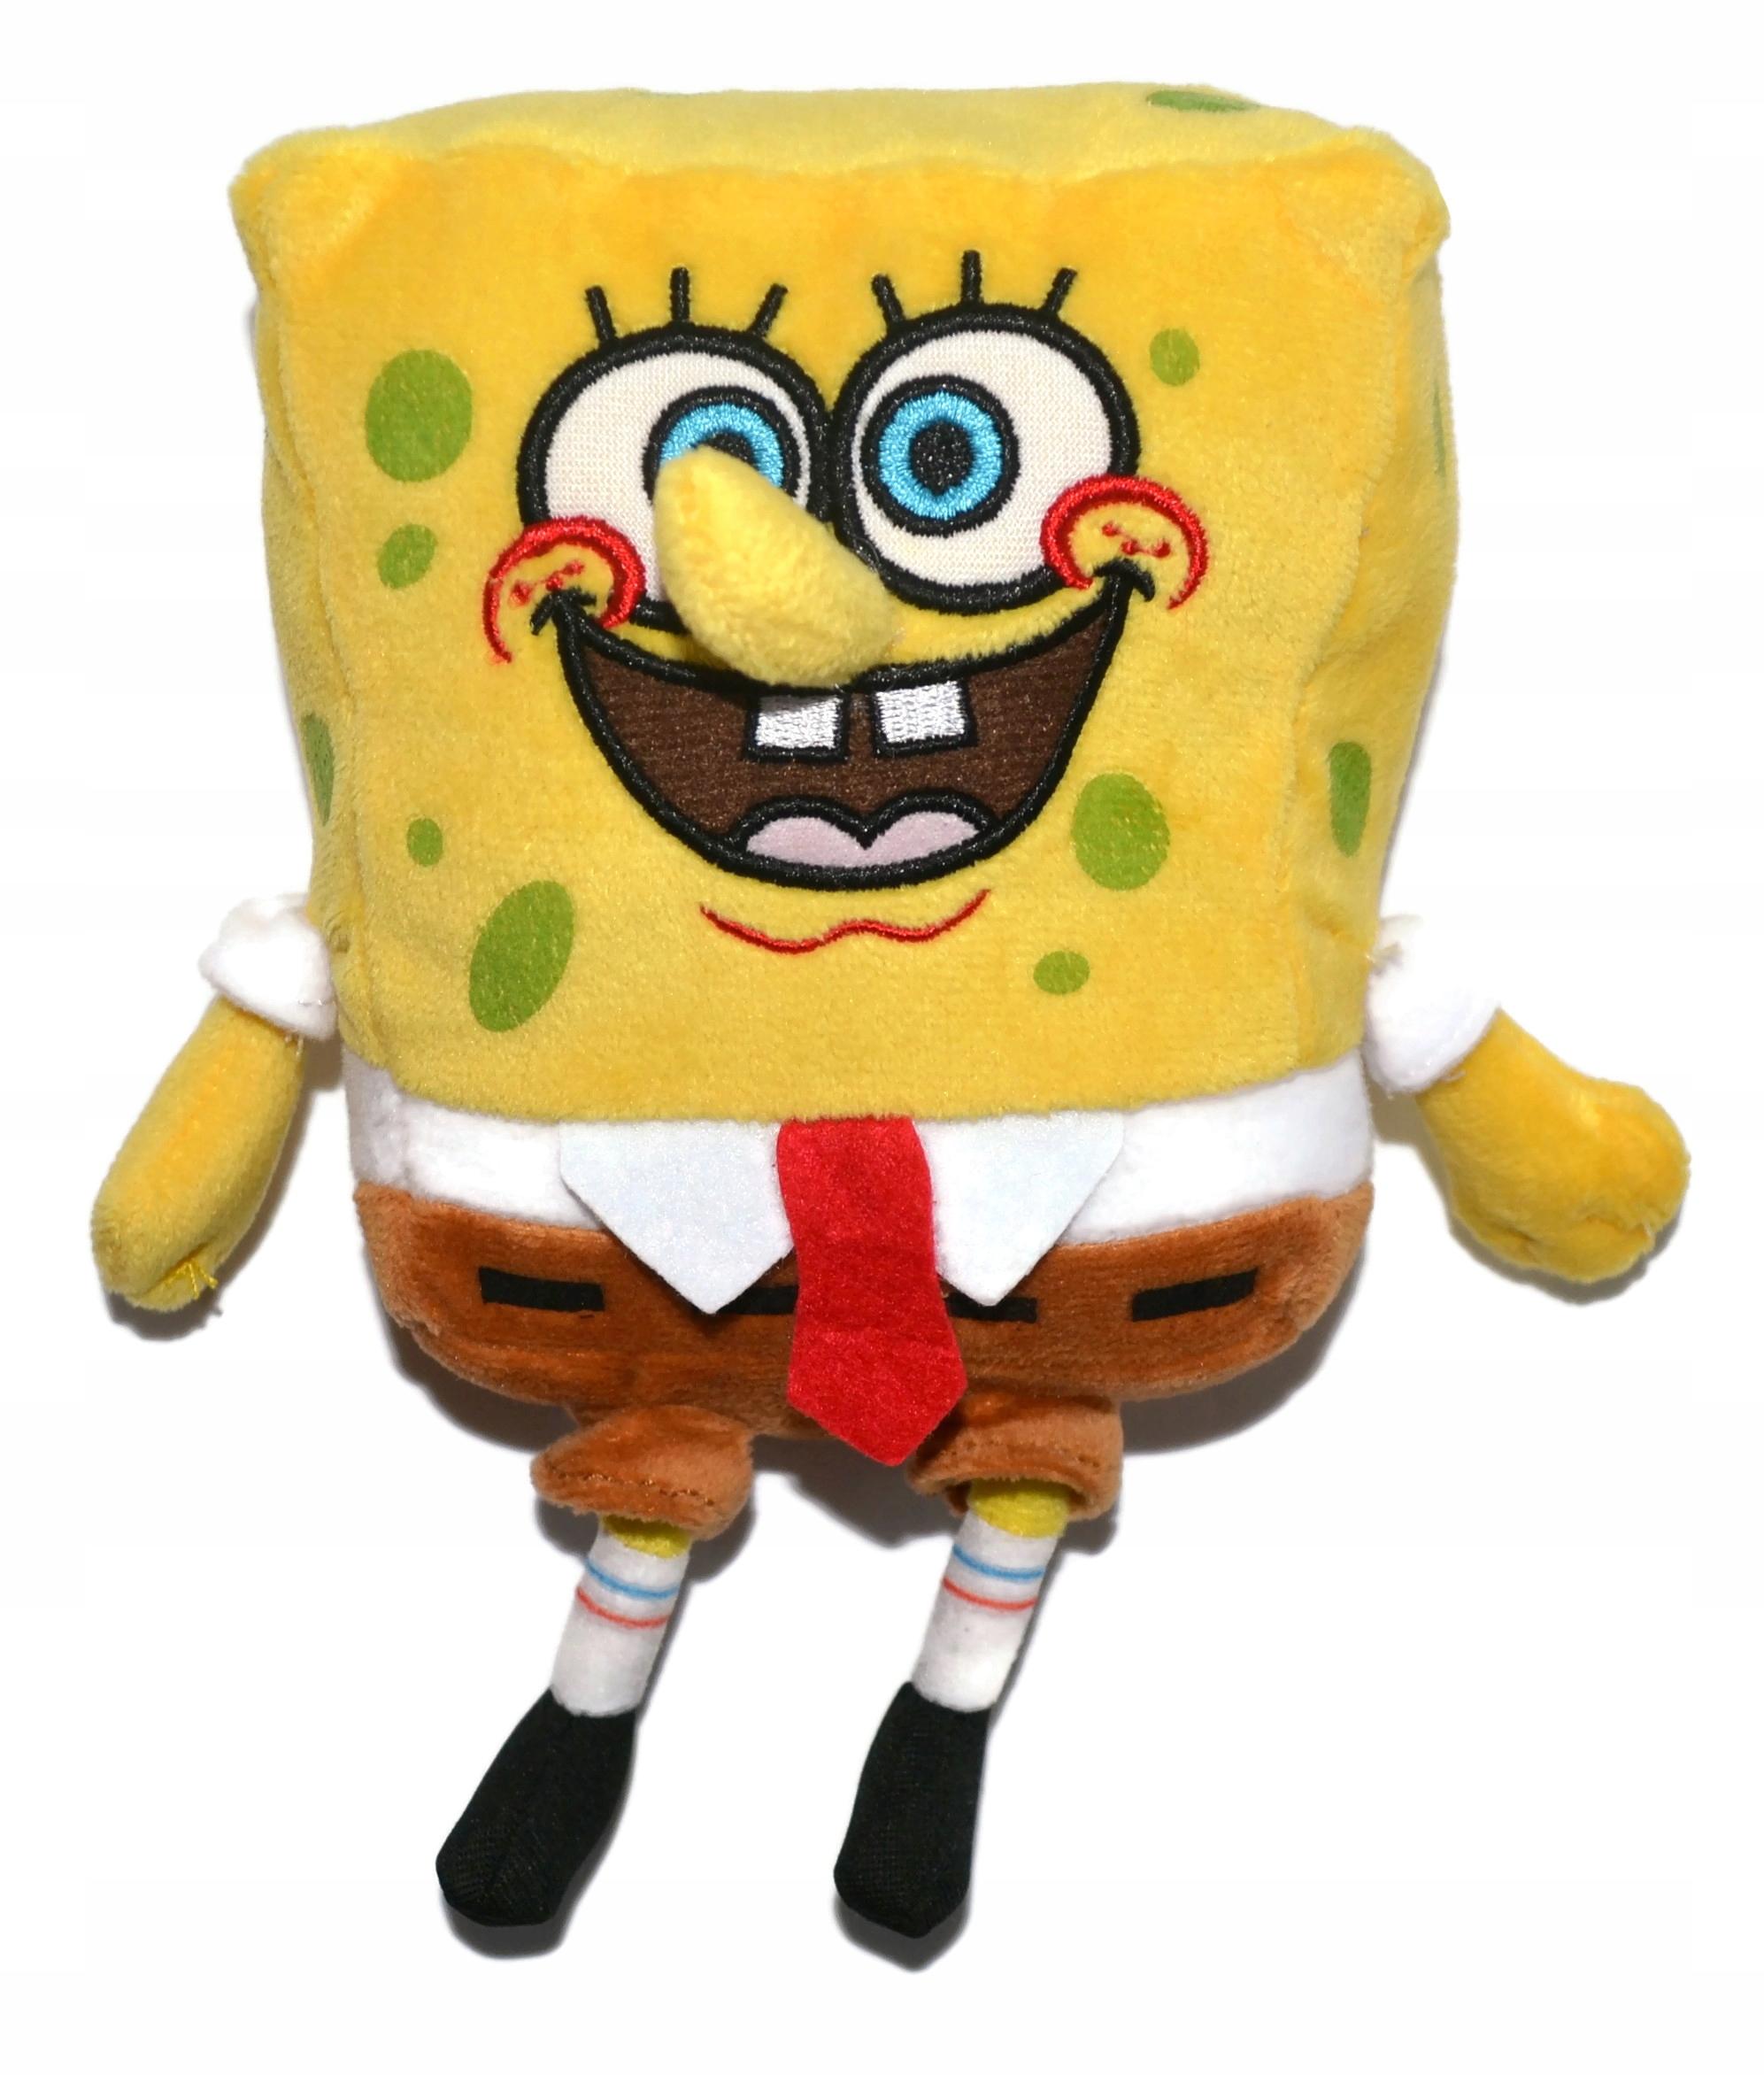 Sponge Bob maskot 20 cm plyšový SPONGEBOB